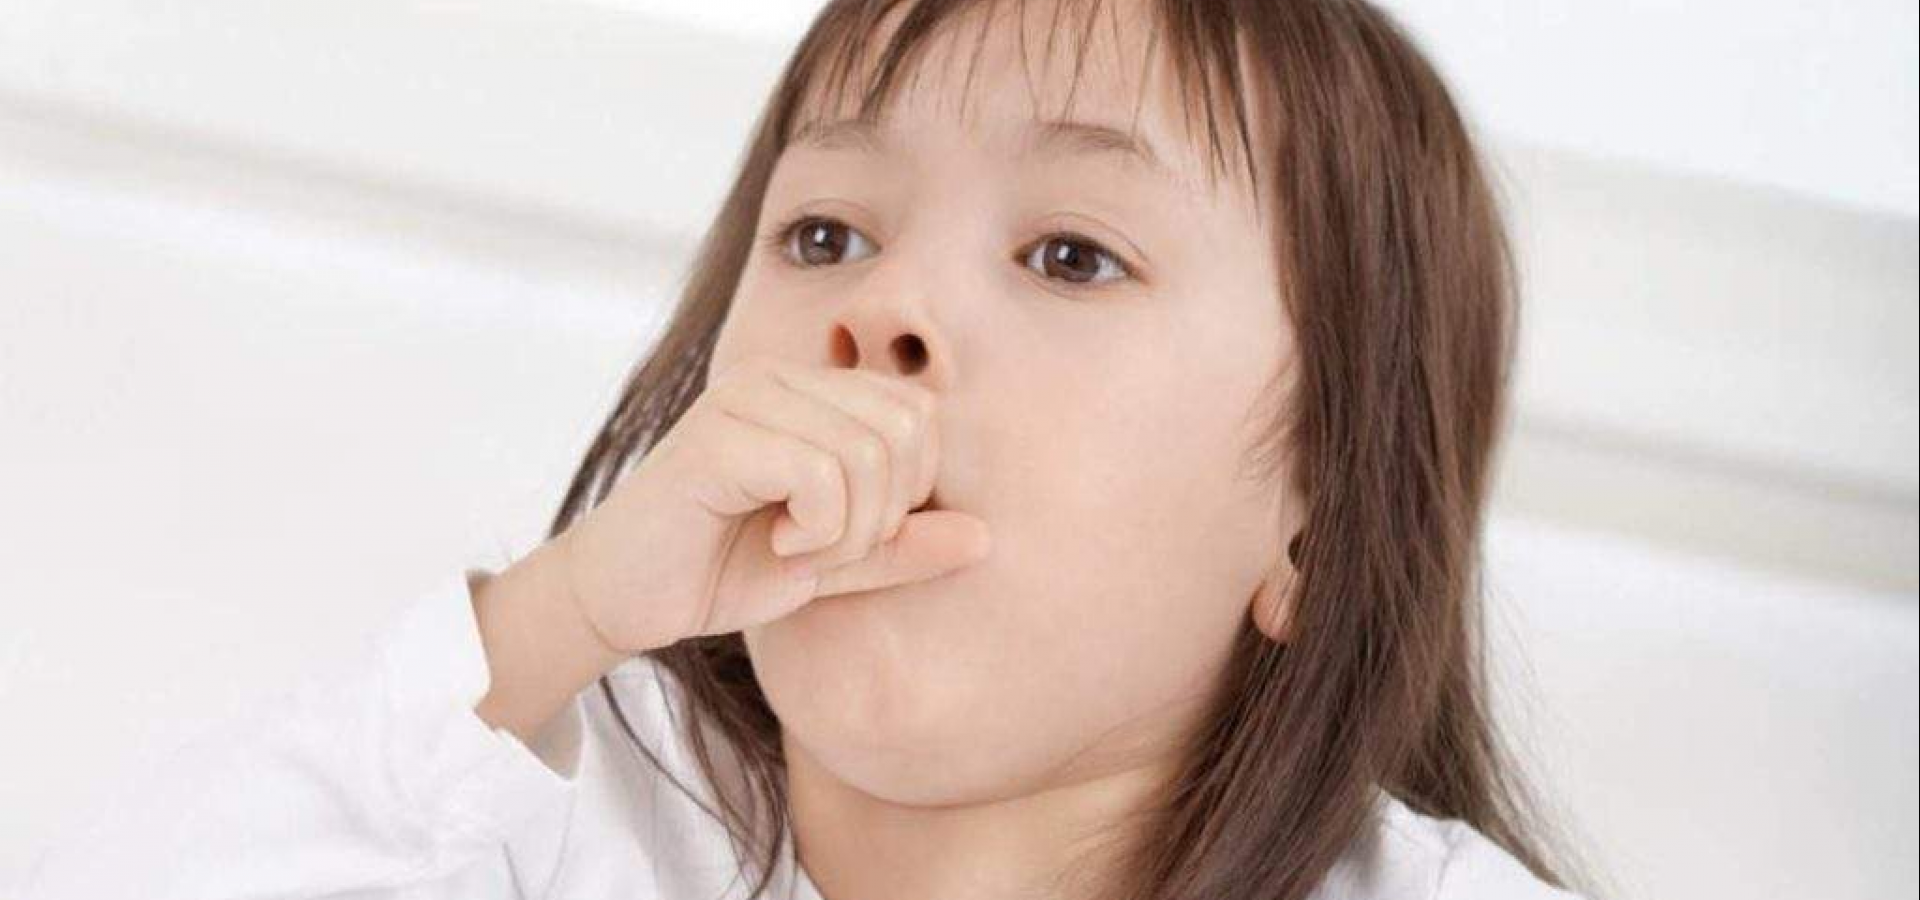 ребенок кхыкает горлом